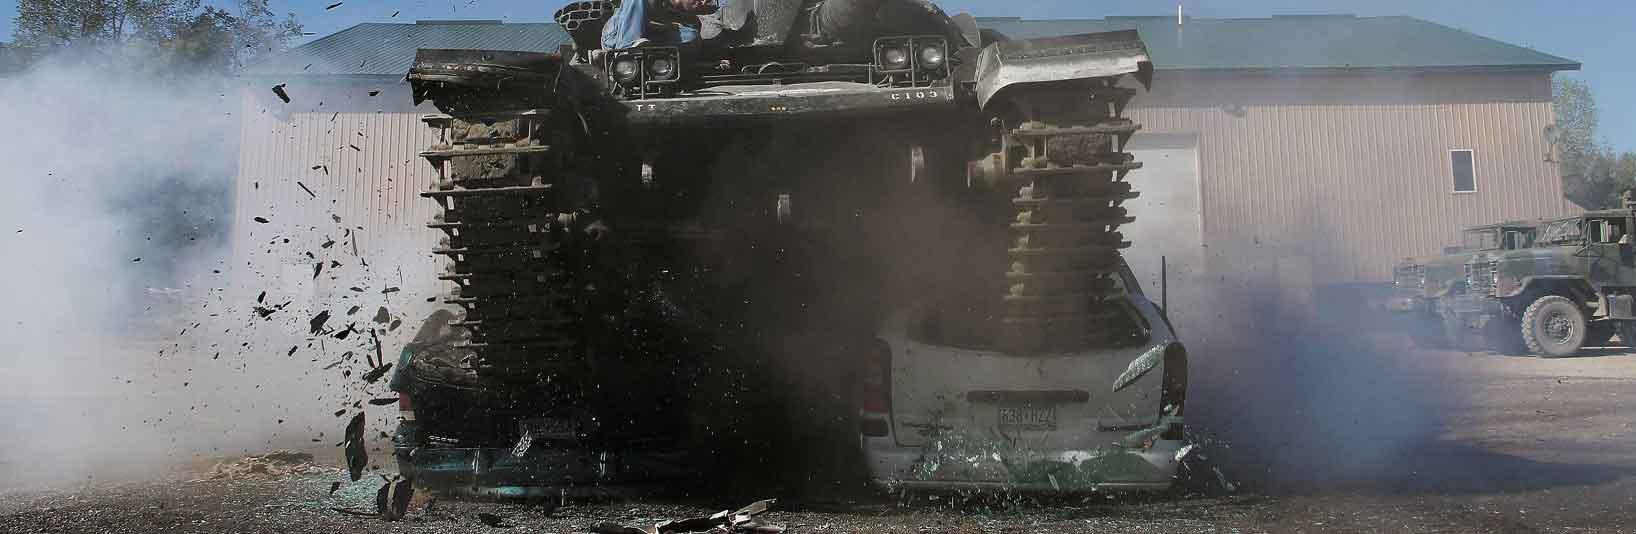 Drive A Tank >> Drive A Tank Tank Driving Car Crushing Machine Gun Shooting